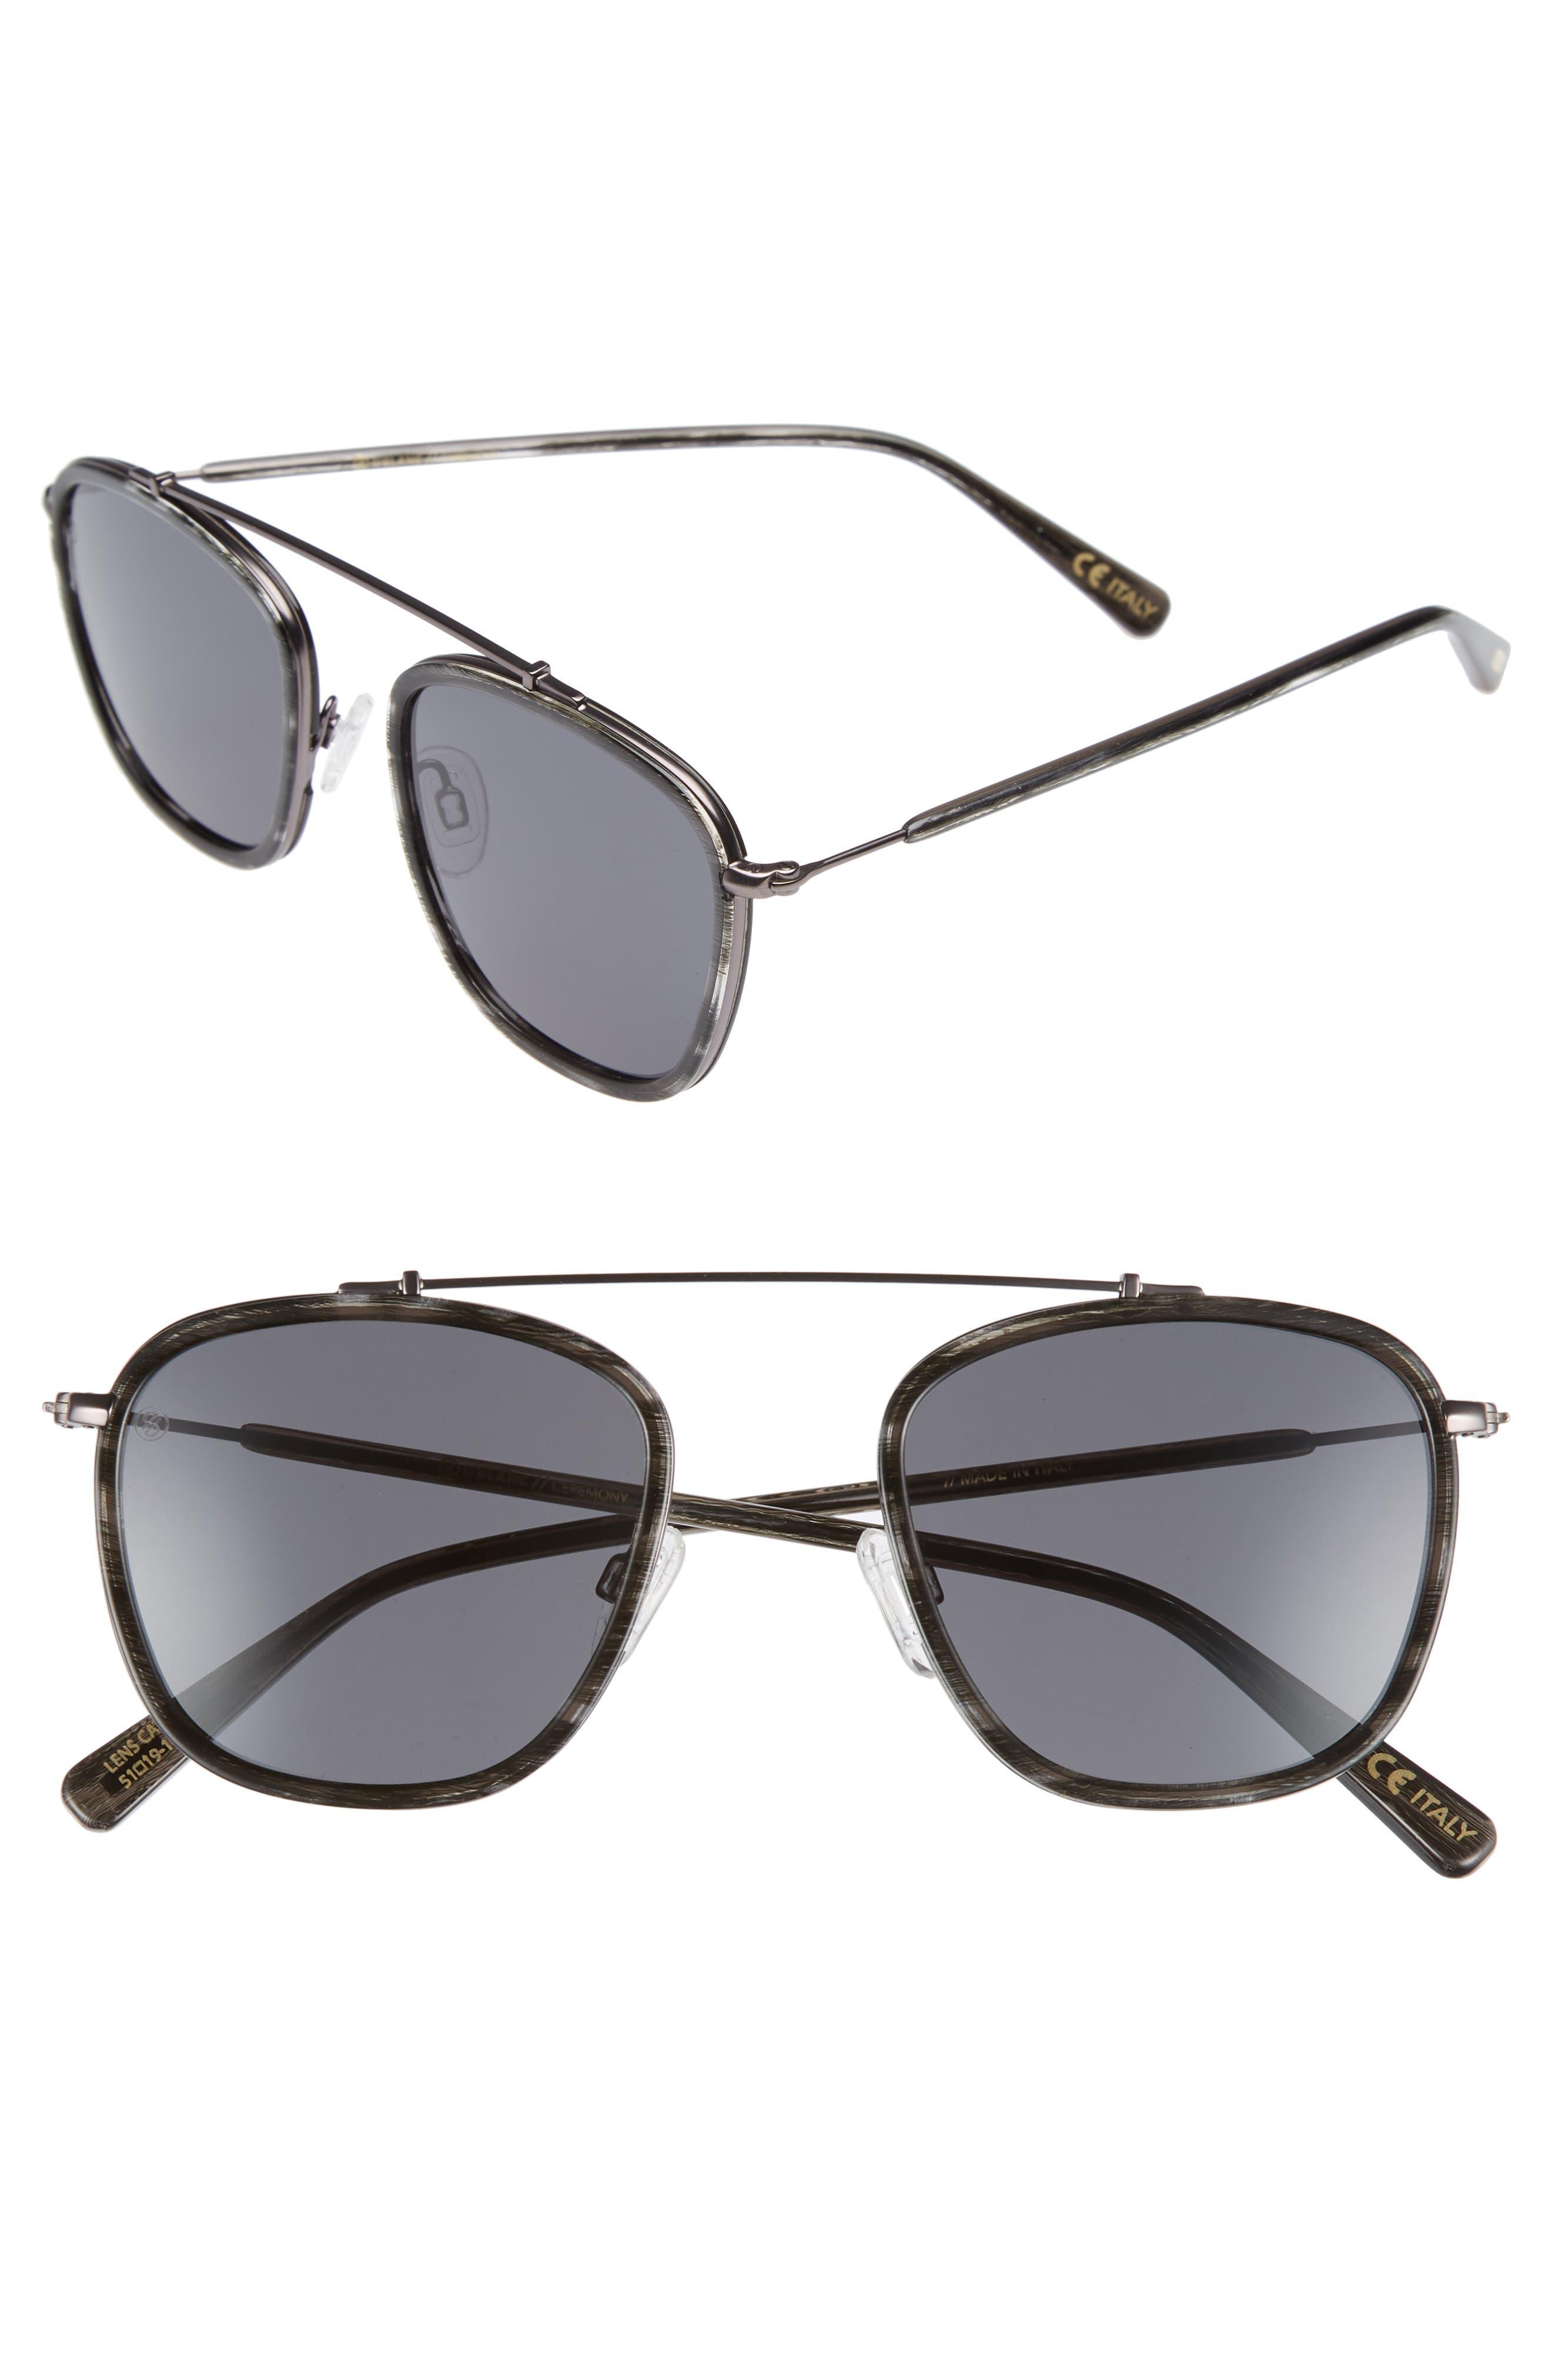 D'BLANC Ceremony 51mm Square Sunglasses,                         Main,                         color, Charcoal Etch/ Grey